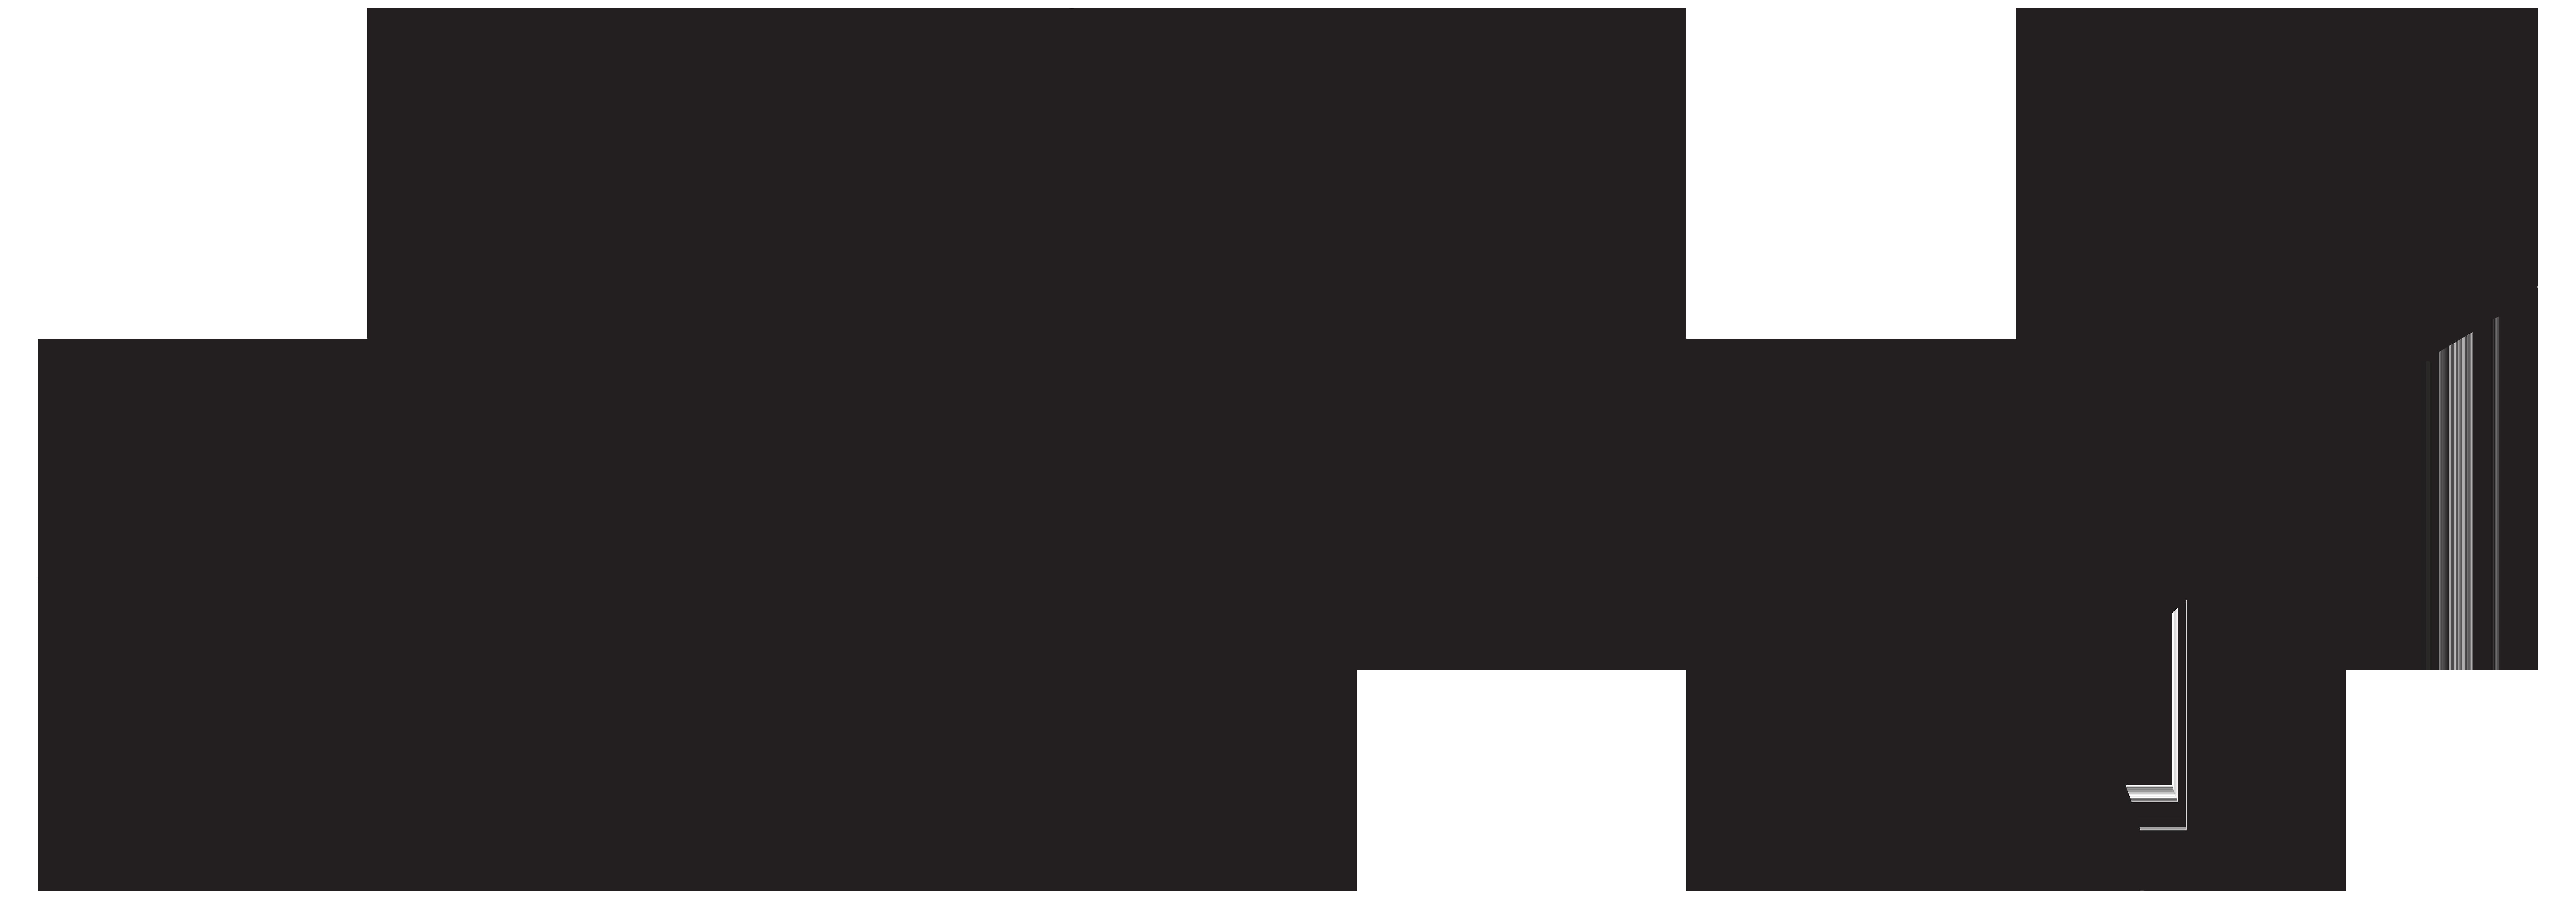 8000x2808 Shark Clipart Png Transparent